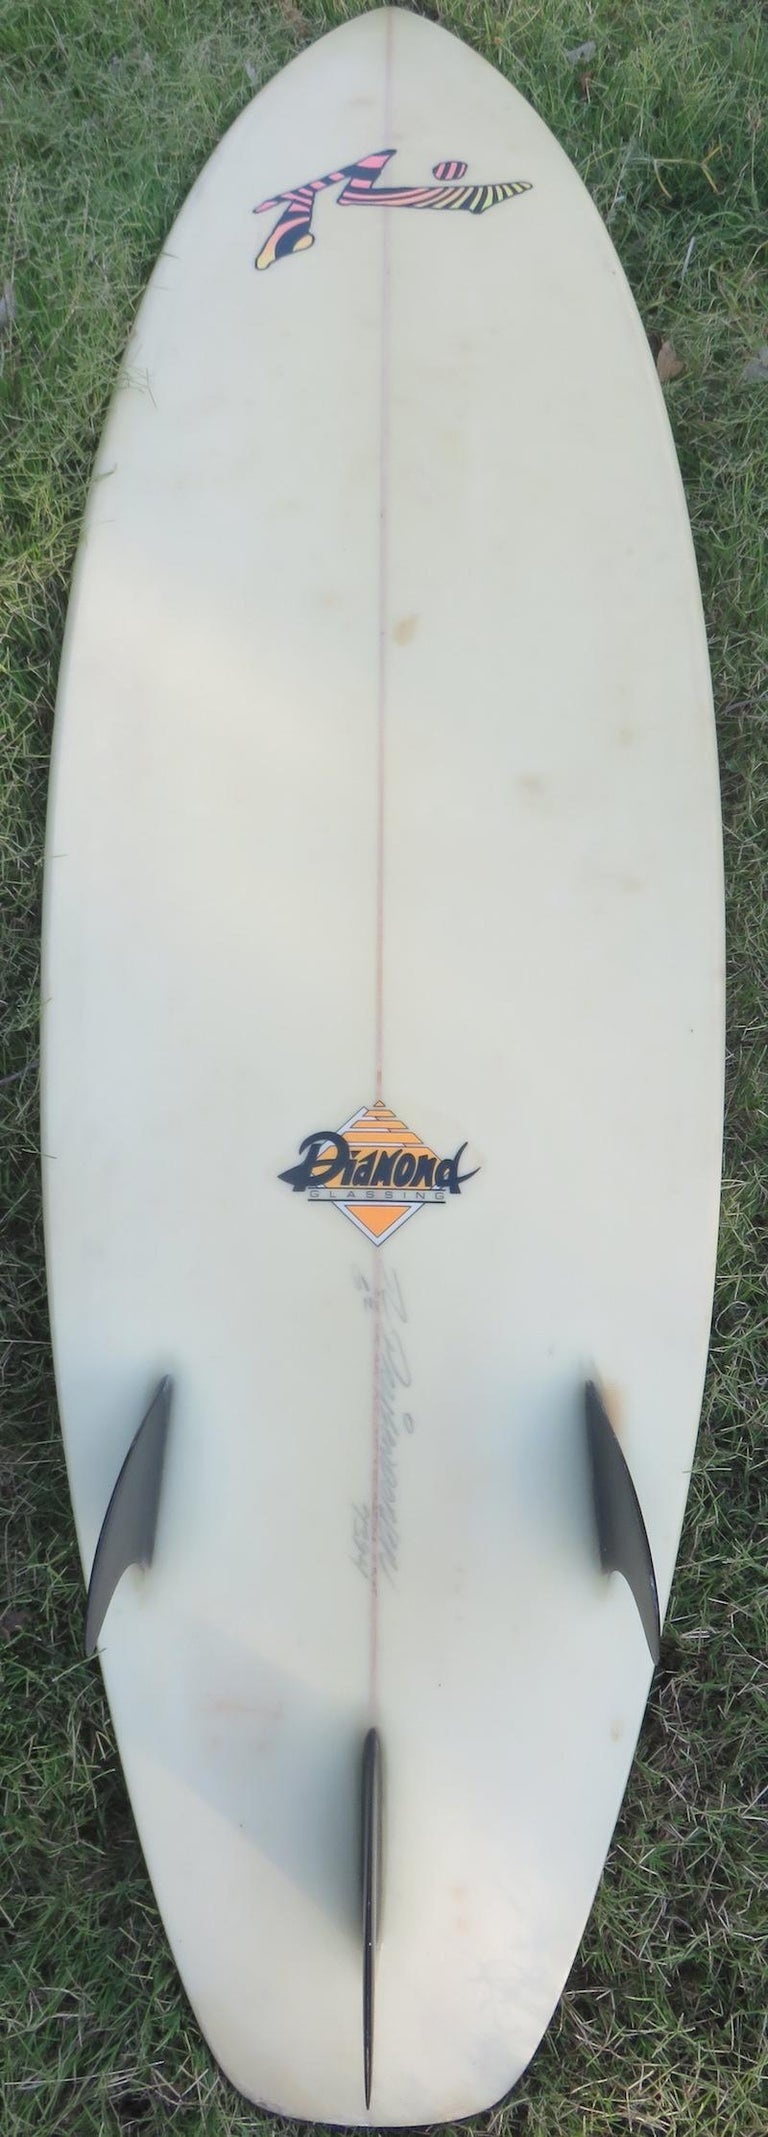 "1980s Vintage Rusty Preisendorfer Surfboard ""Surf on Planet X"" by Stephen Cruz 3"